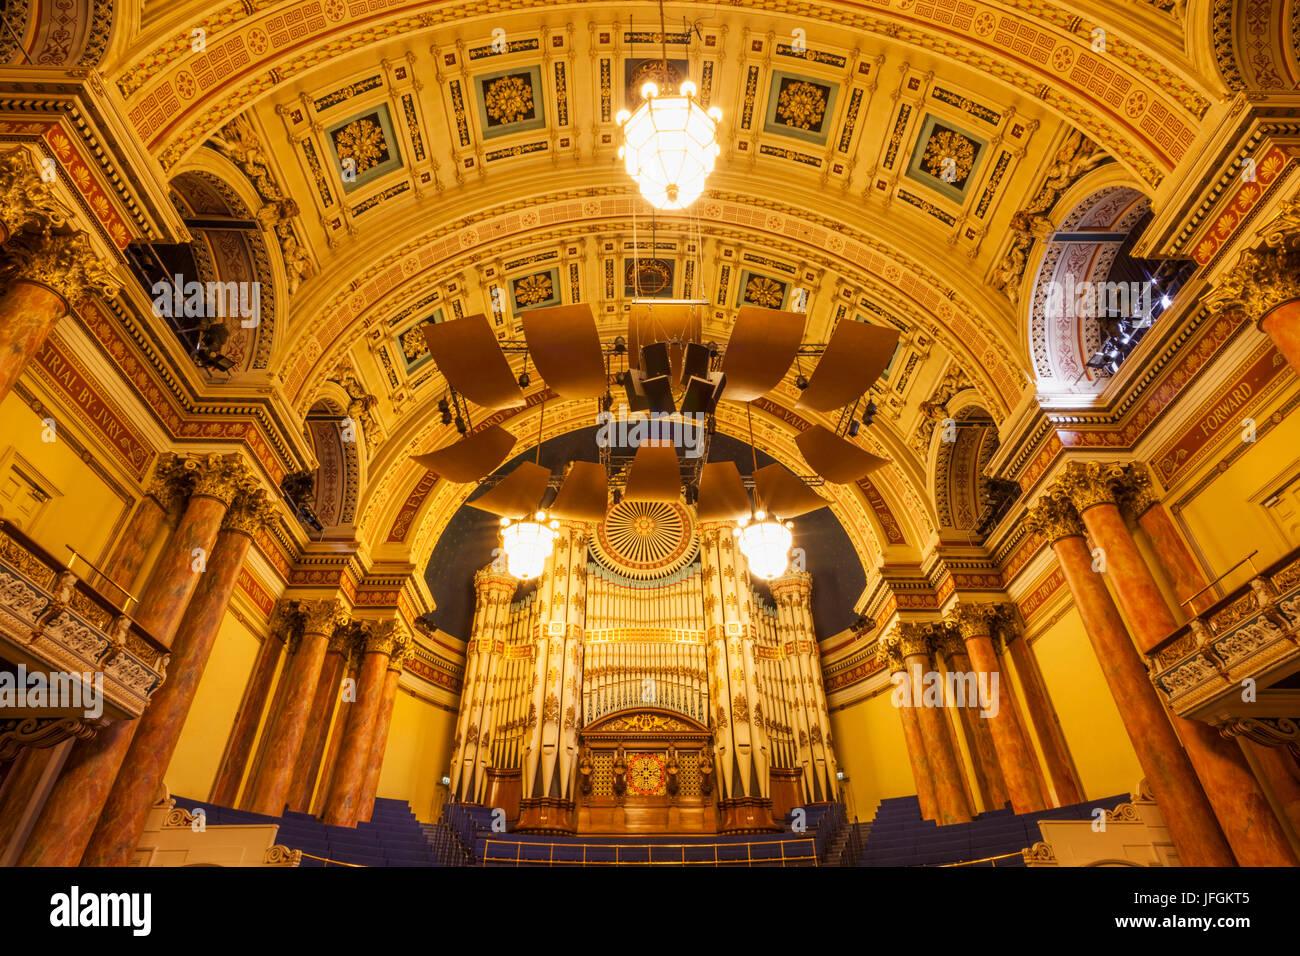 England, Yorkshire, Leeds, Leeds Town Hall, The Albert Room - Stock Image